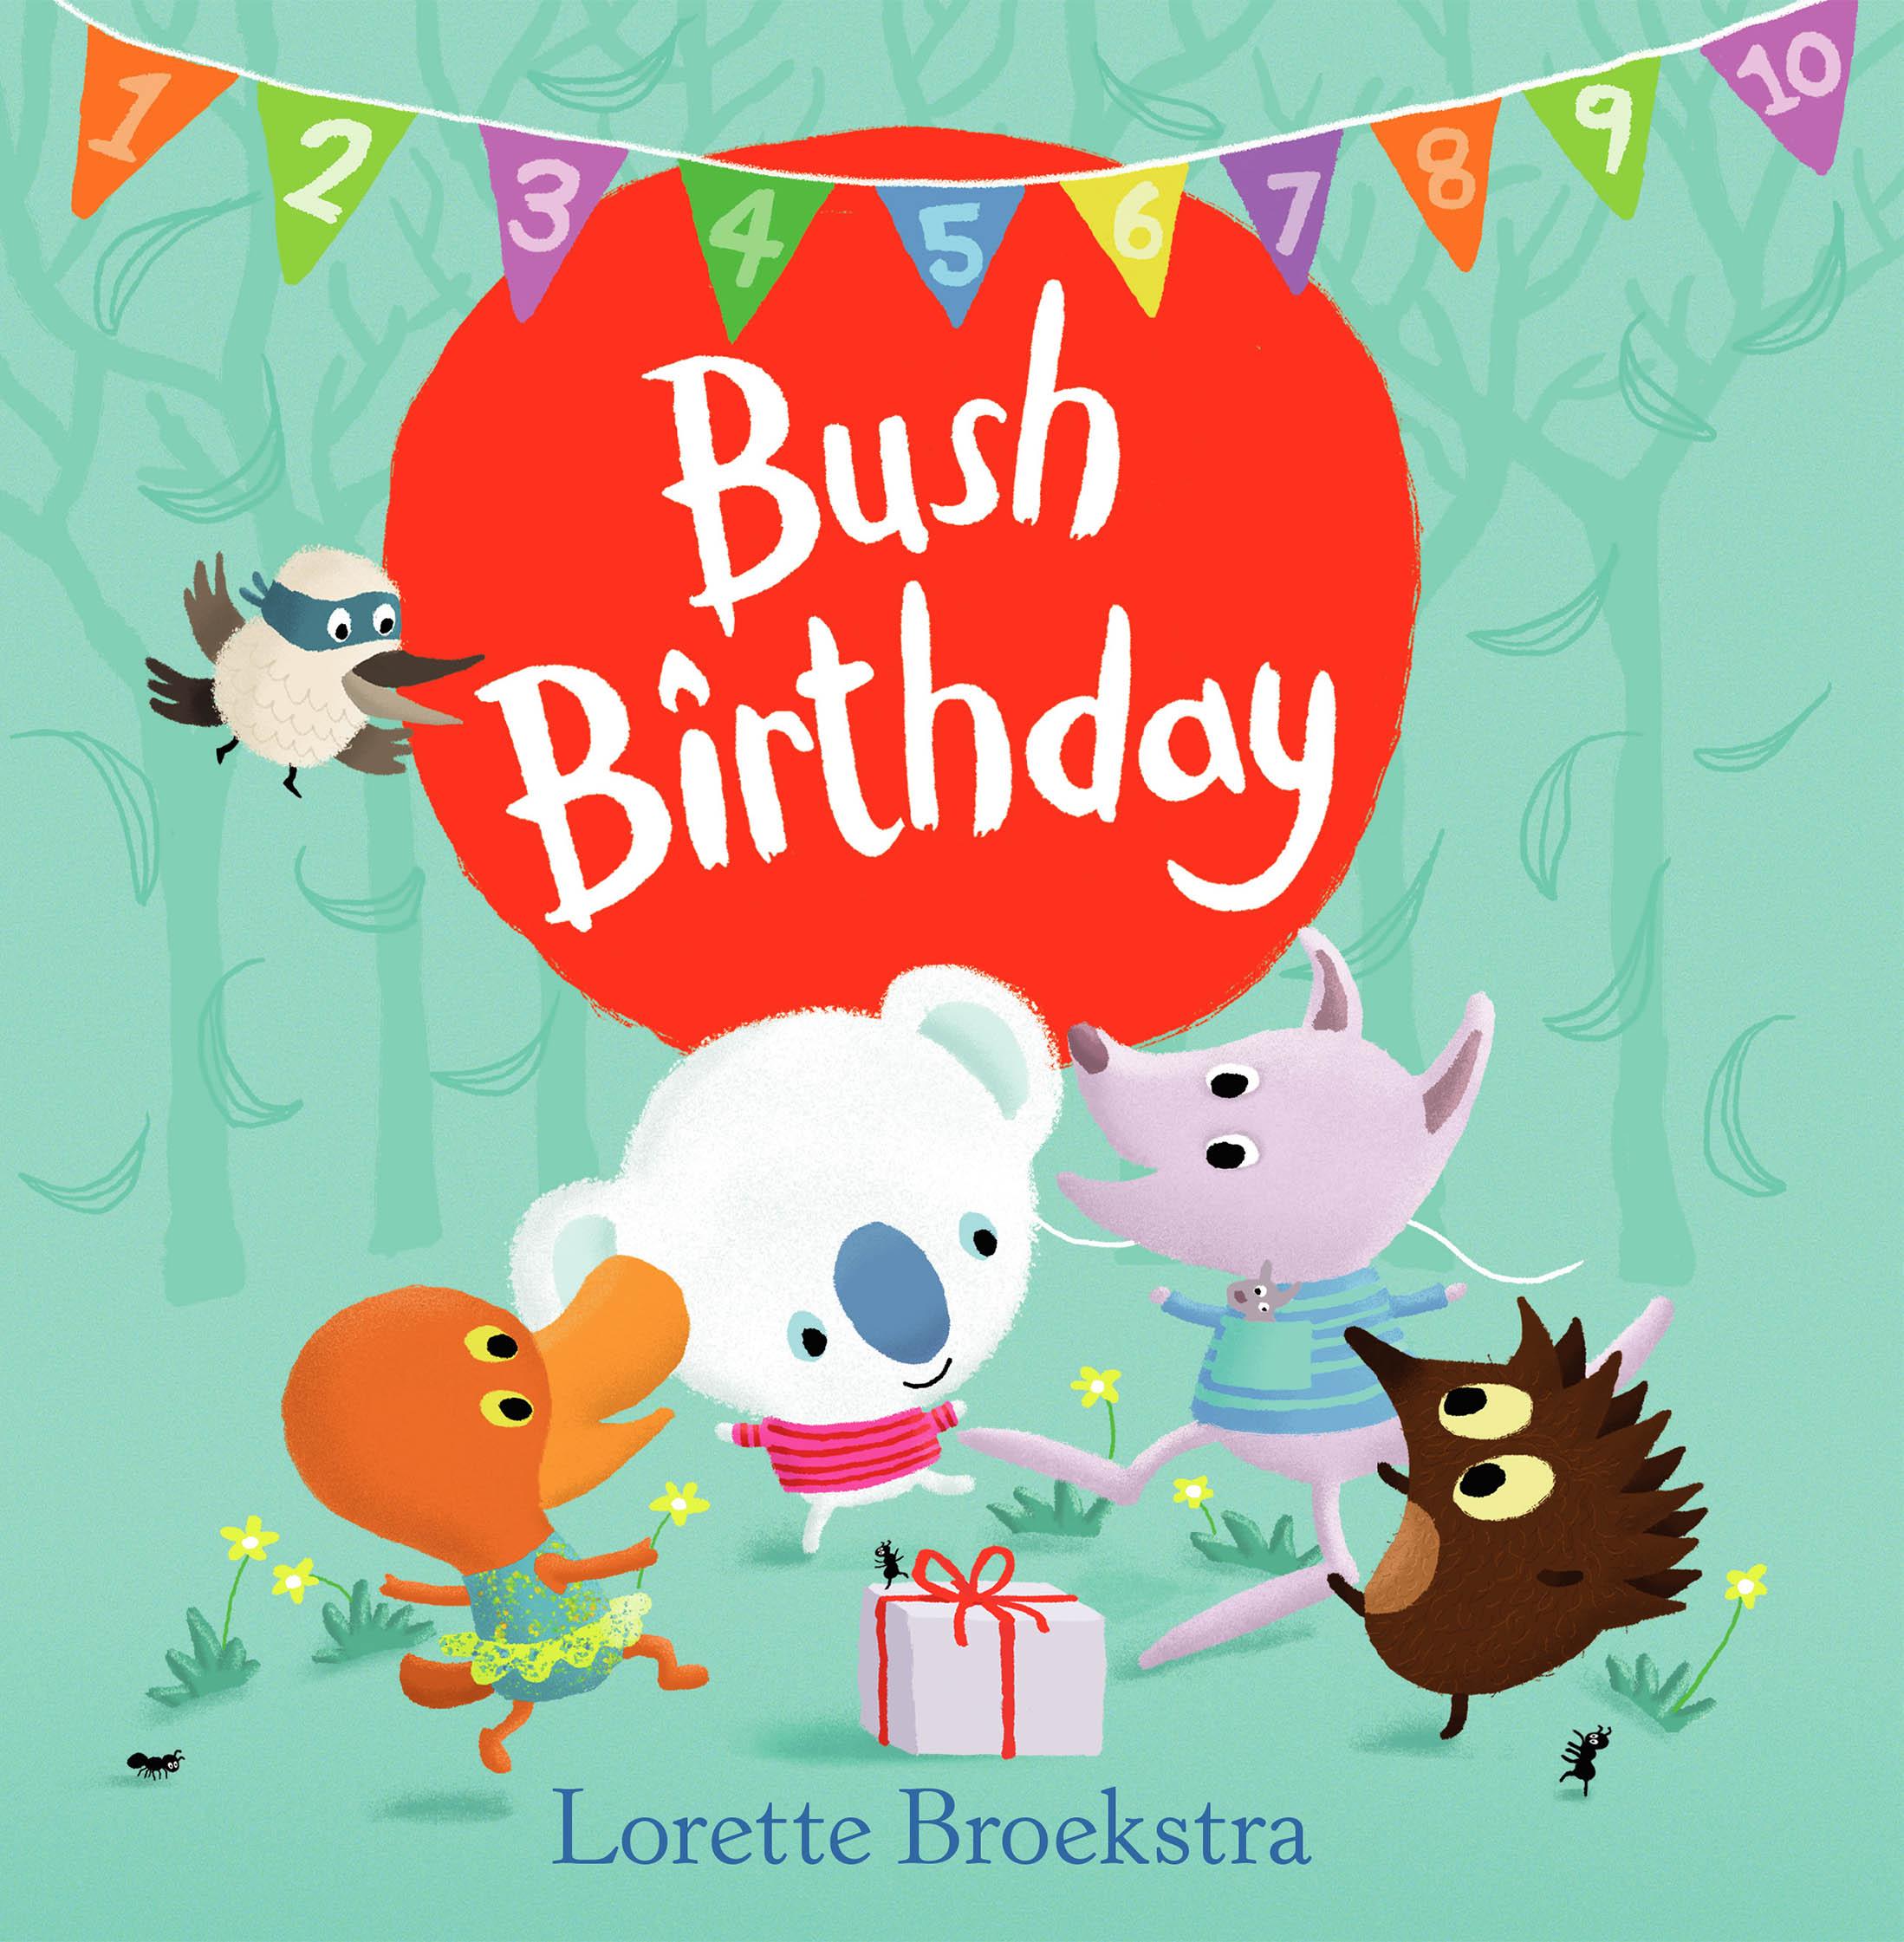 Bush Birthday